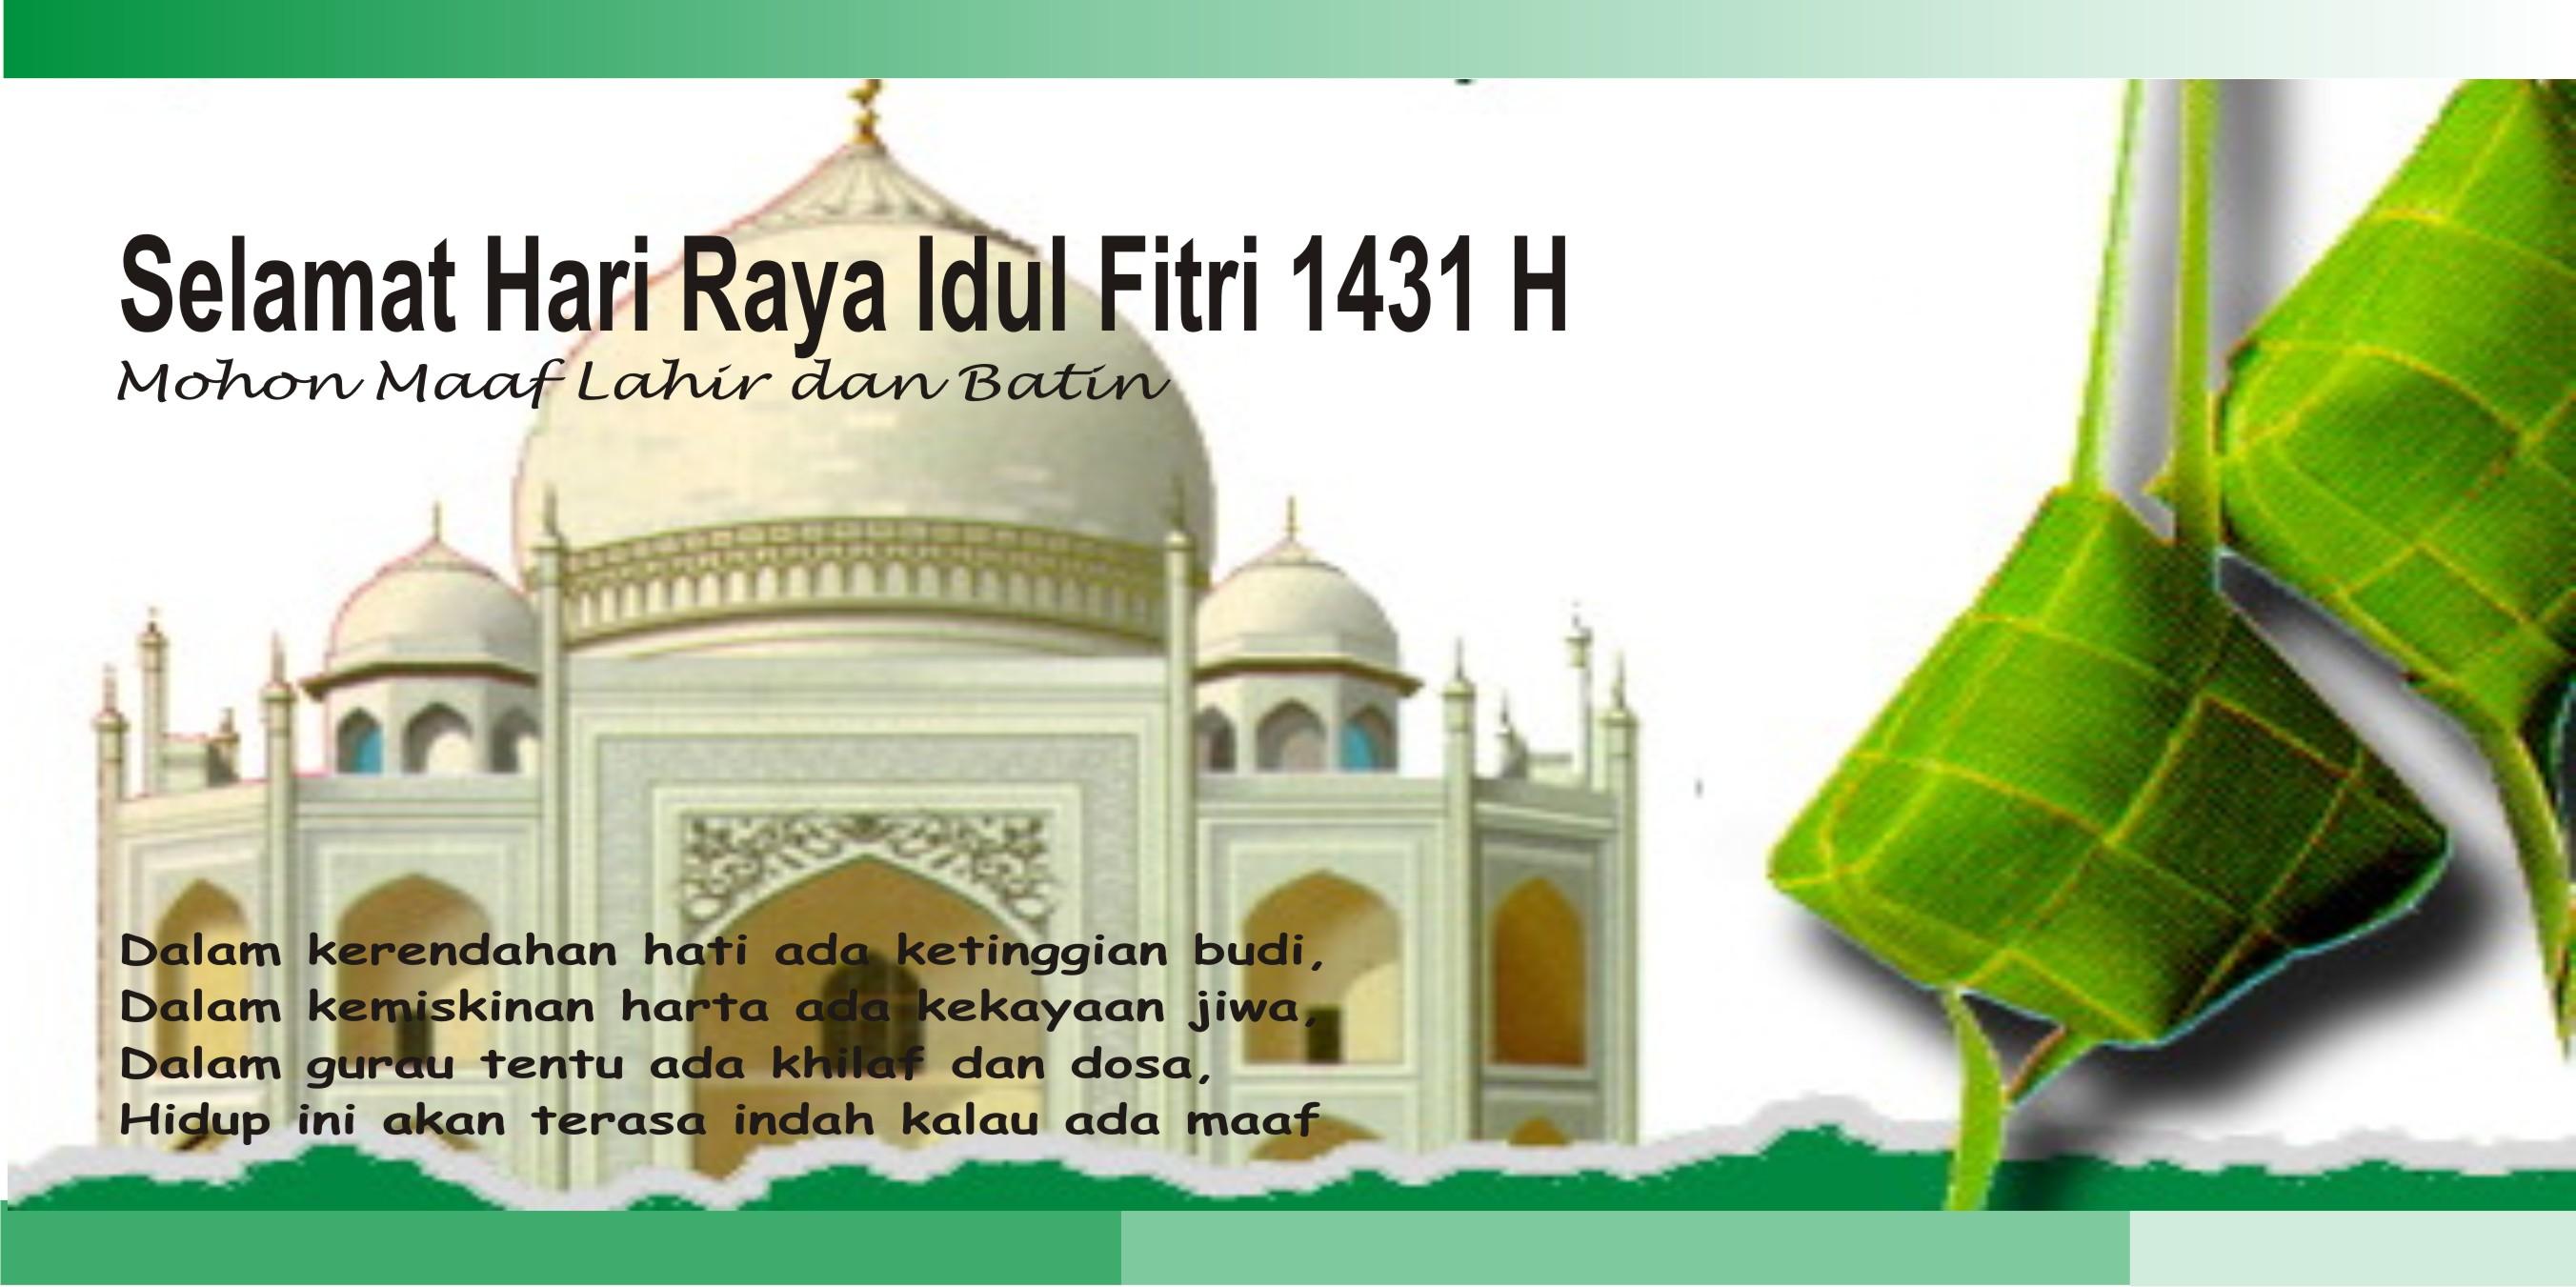 Kartu Selamat Hari Raya Idul Fitri 1433 H Walhi Jawa Barat | Apps ...